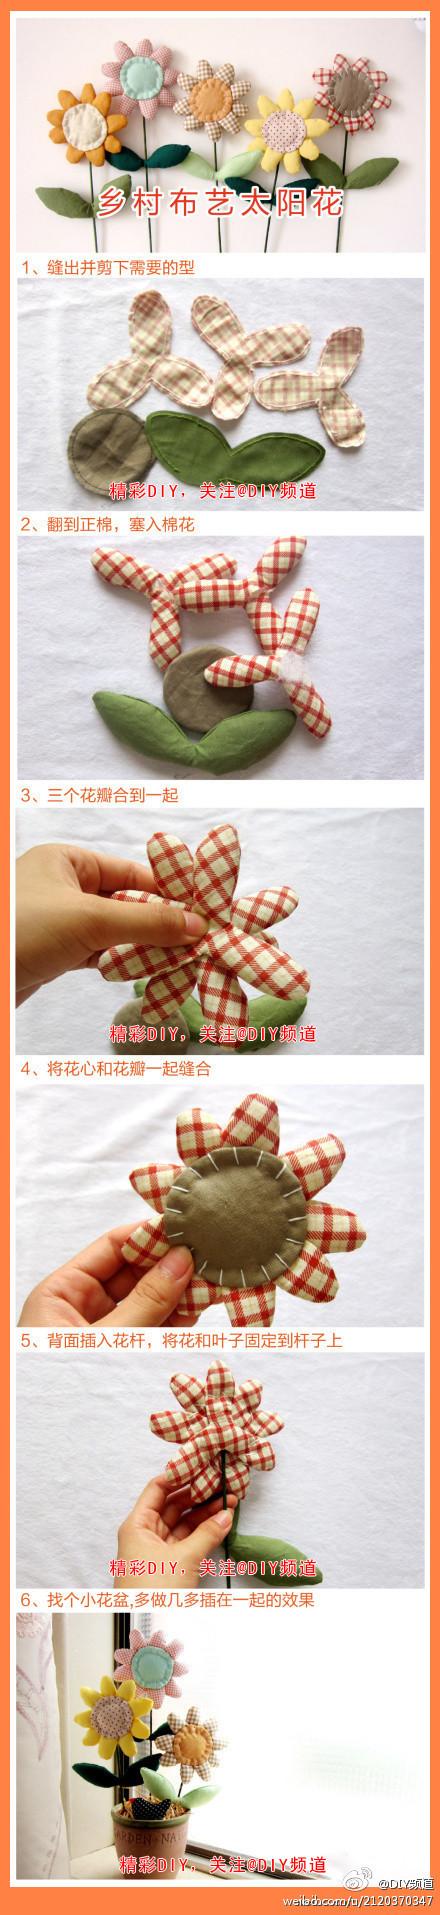 Making your own felt flowers for a flowerpot. Cute idea. :)